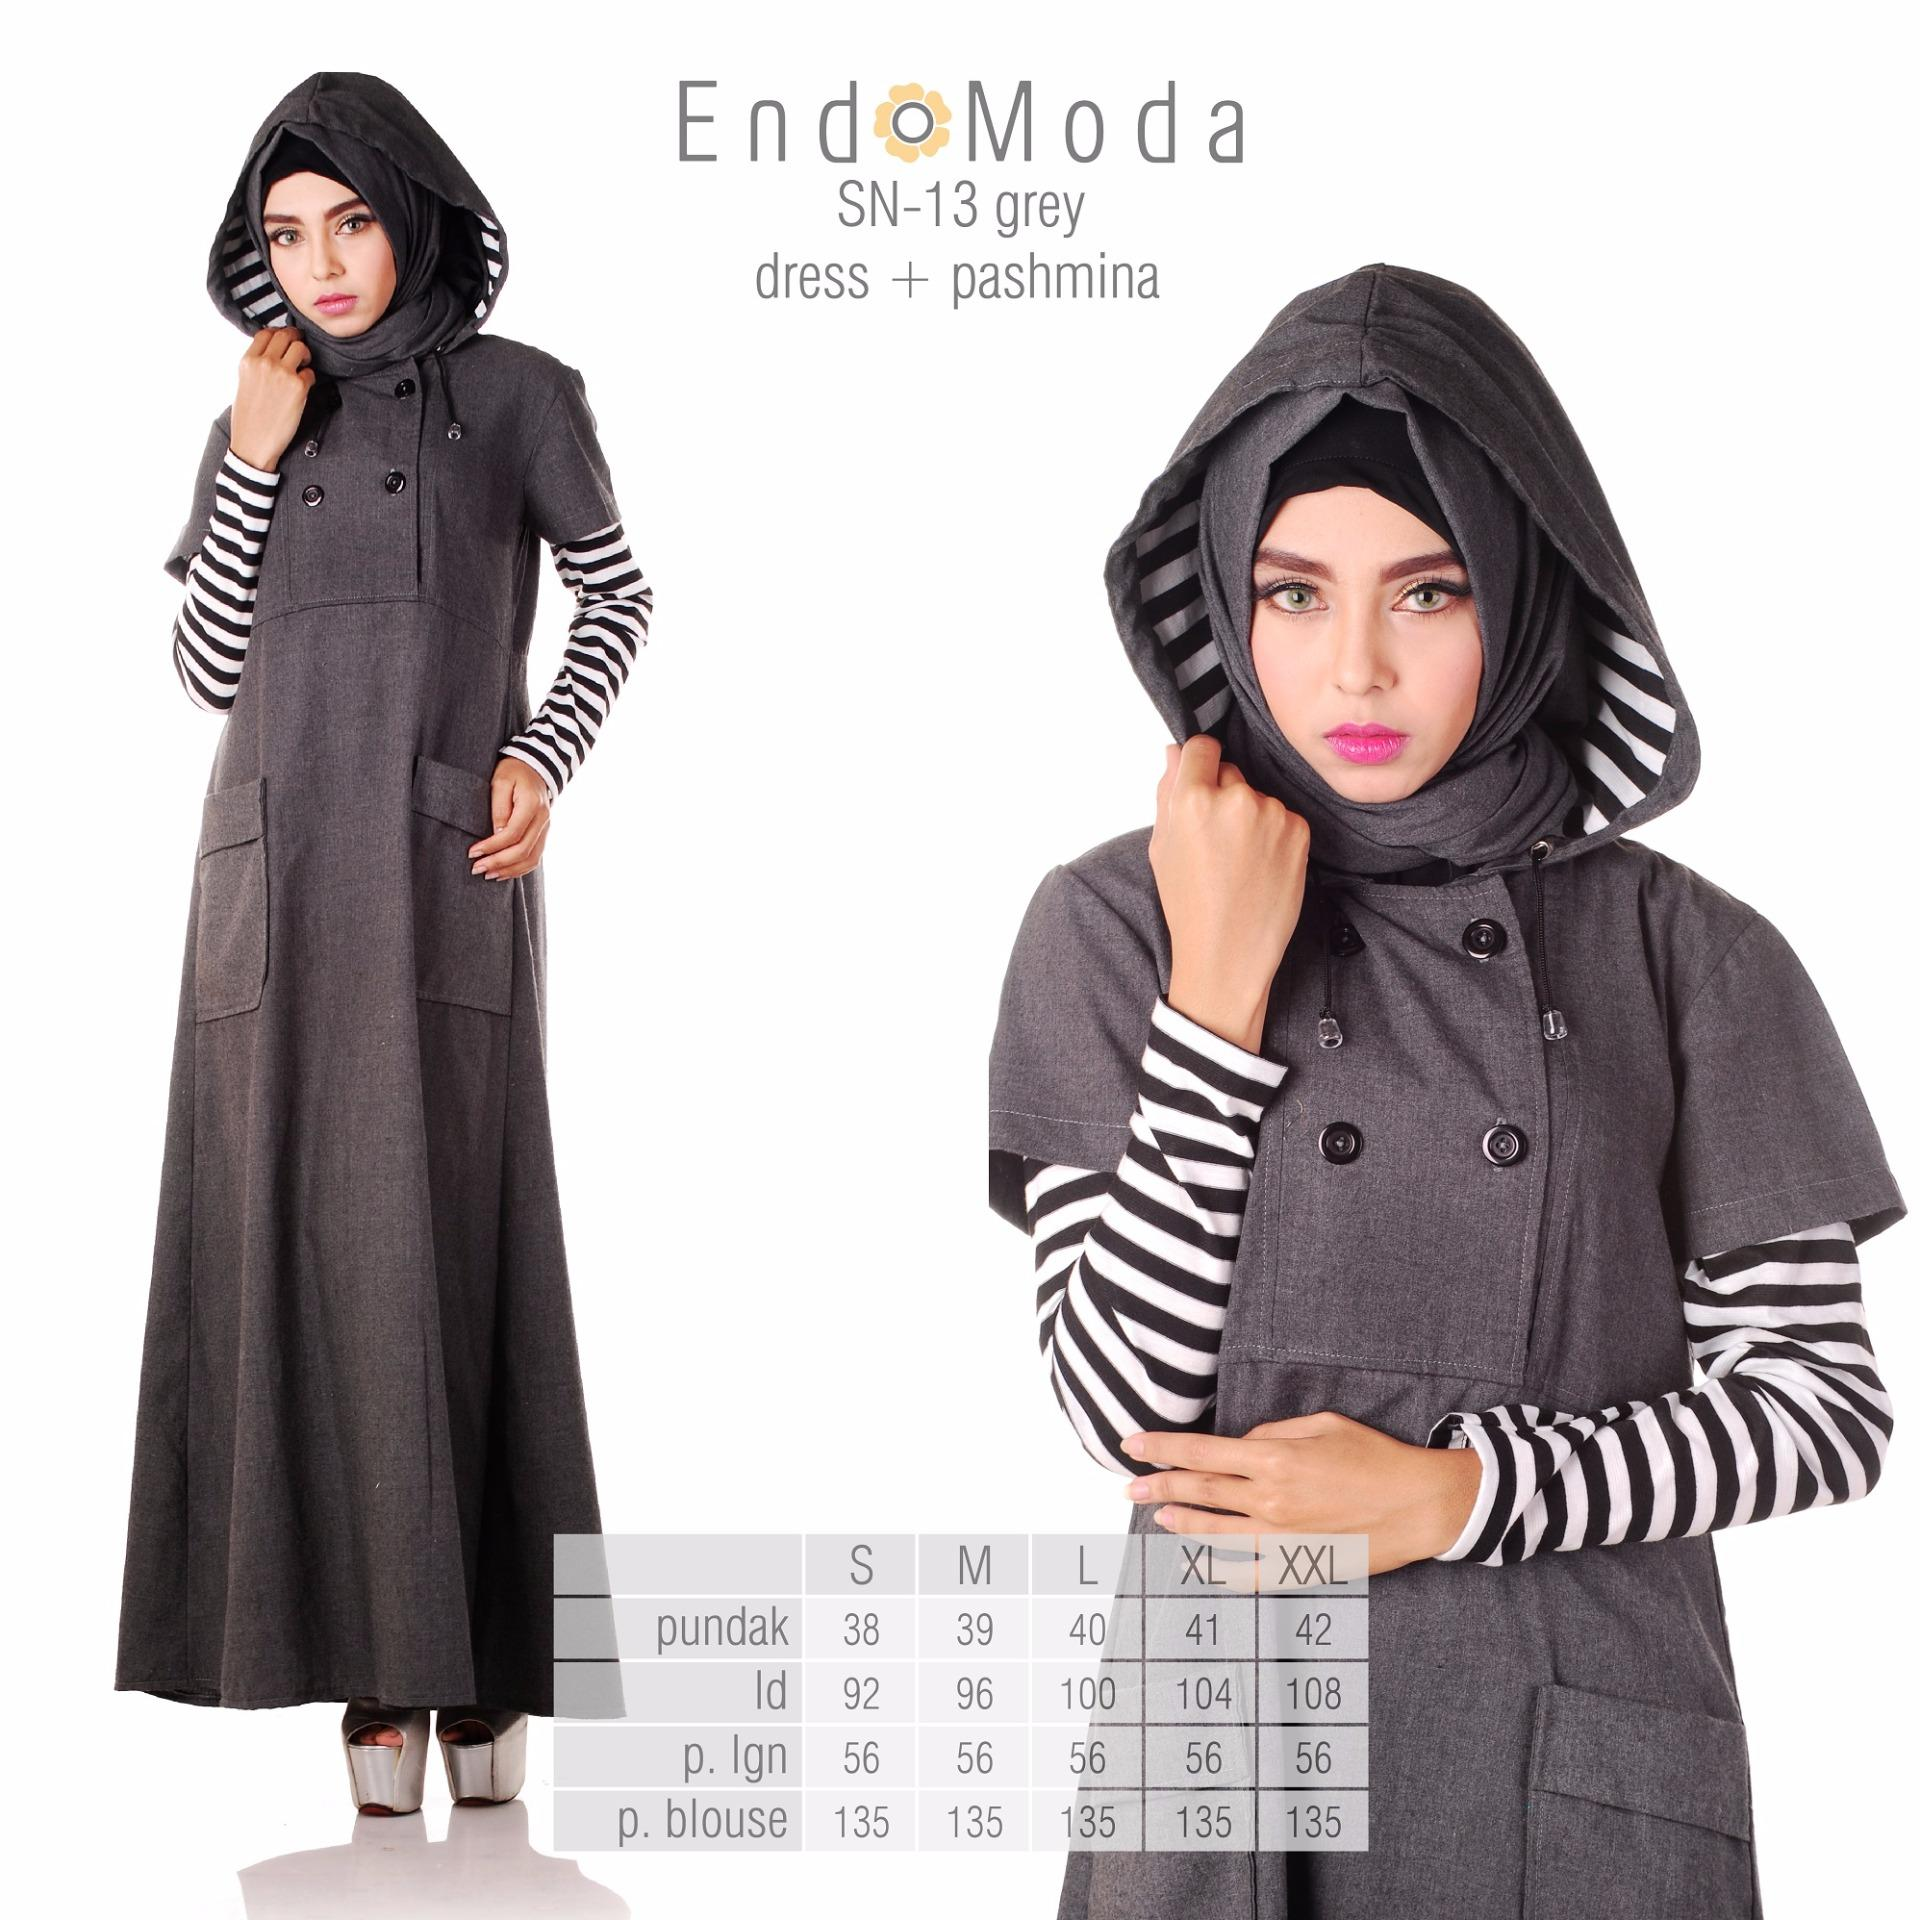 ... Baju Original Endo Moda SN-13 Dress Wanita Baju Muslim Modern Gamis  Katun Supernova Premium d8bf77a789